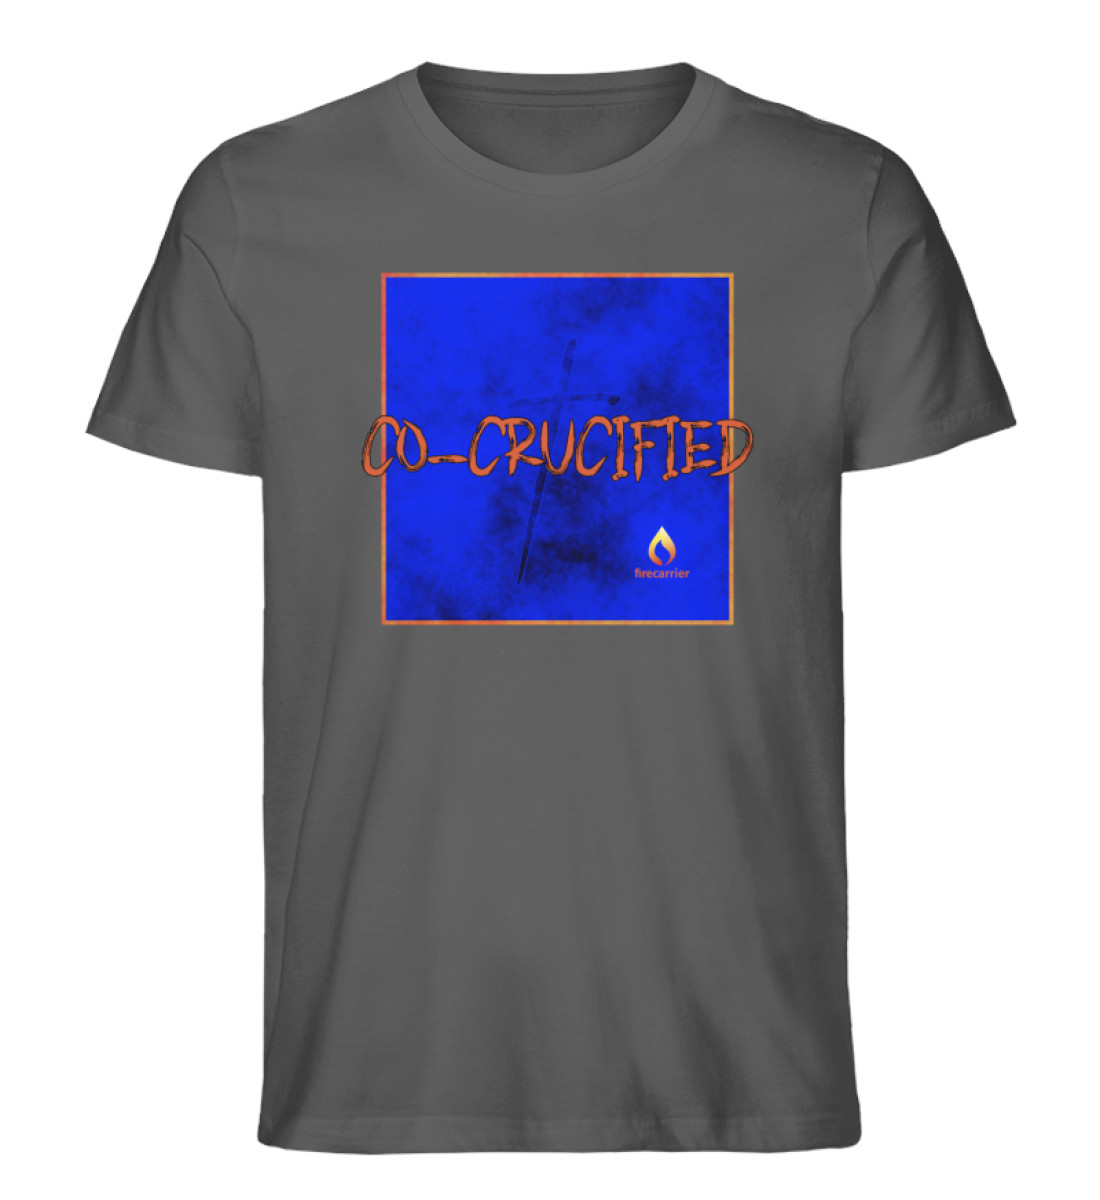 cocrucified - Men Premium Organic Shirt-6903